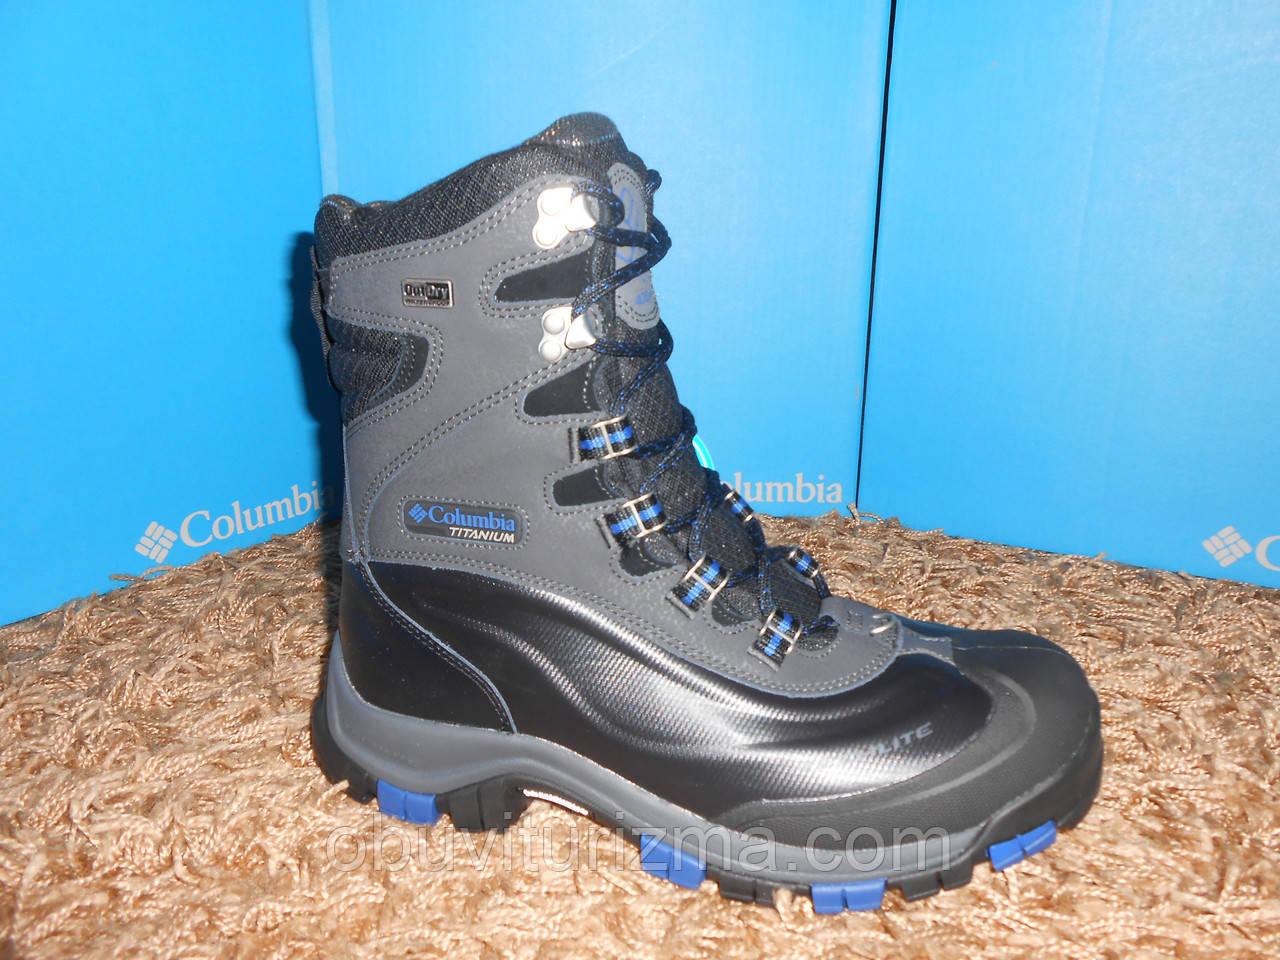 Ботинки Columbia Bugaboot™ Plus Titanium Outdry 400-gram - 43C (9 ... 59574f84b5f12